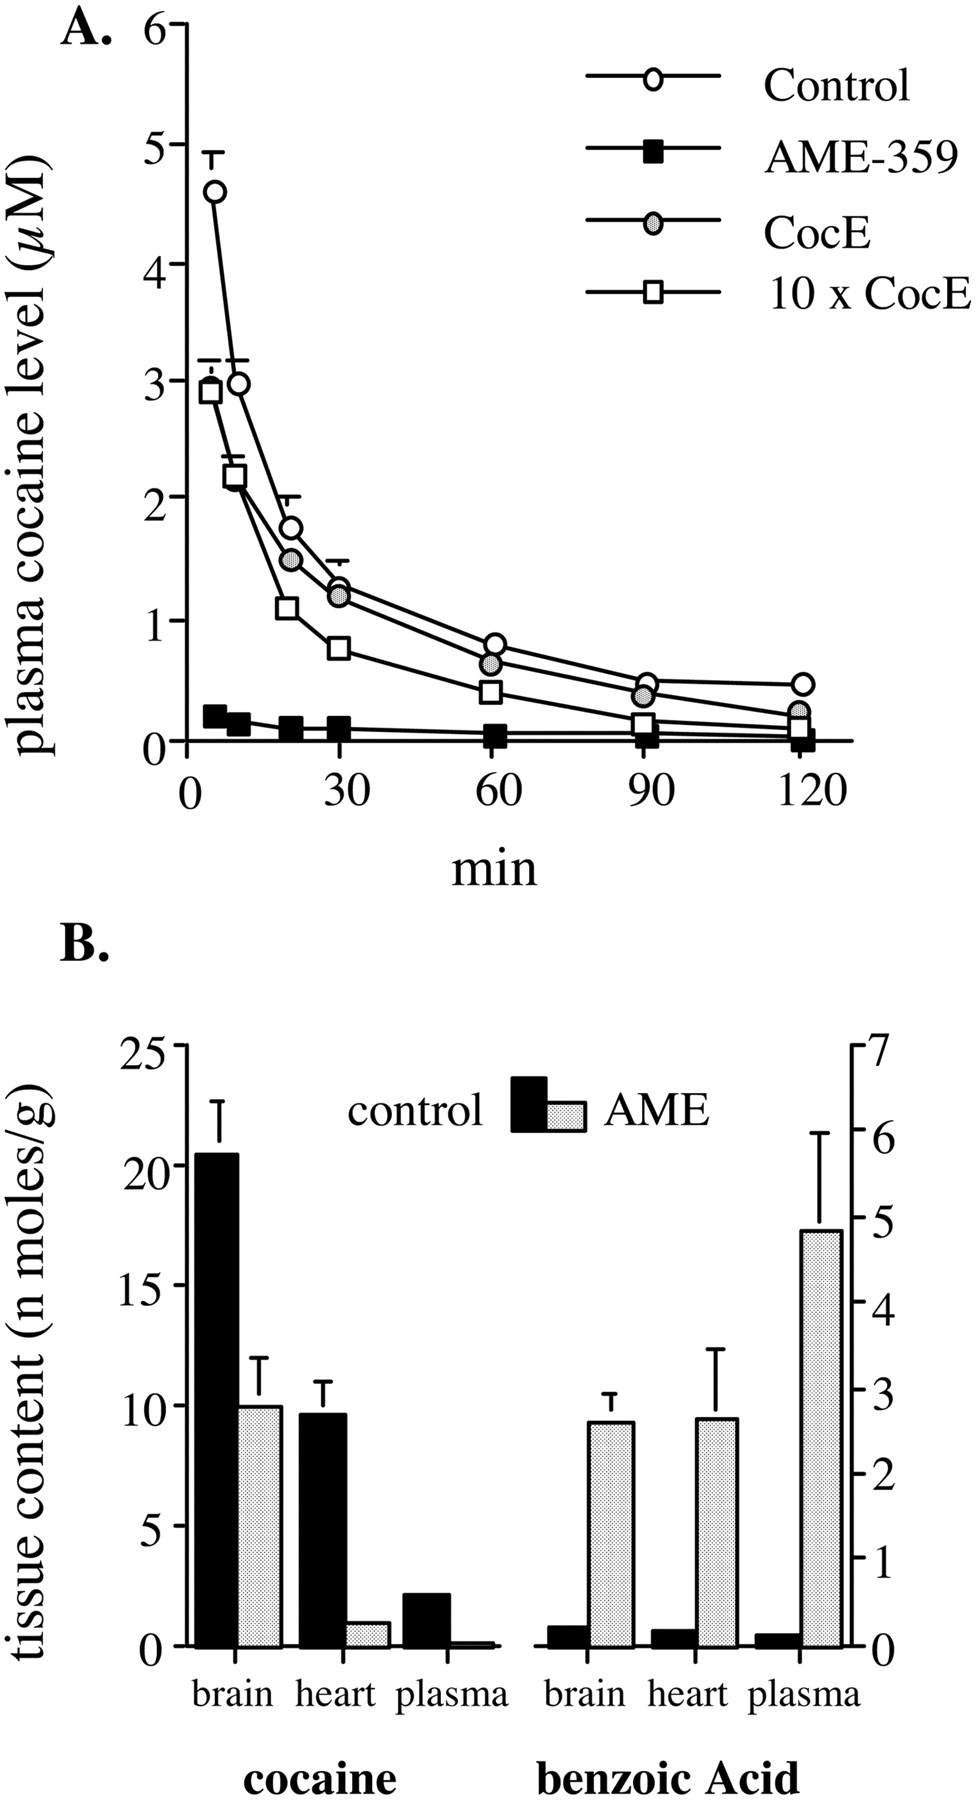 Gene Transfer of Cocaine Hydrolase Suppresses Cardiovascular